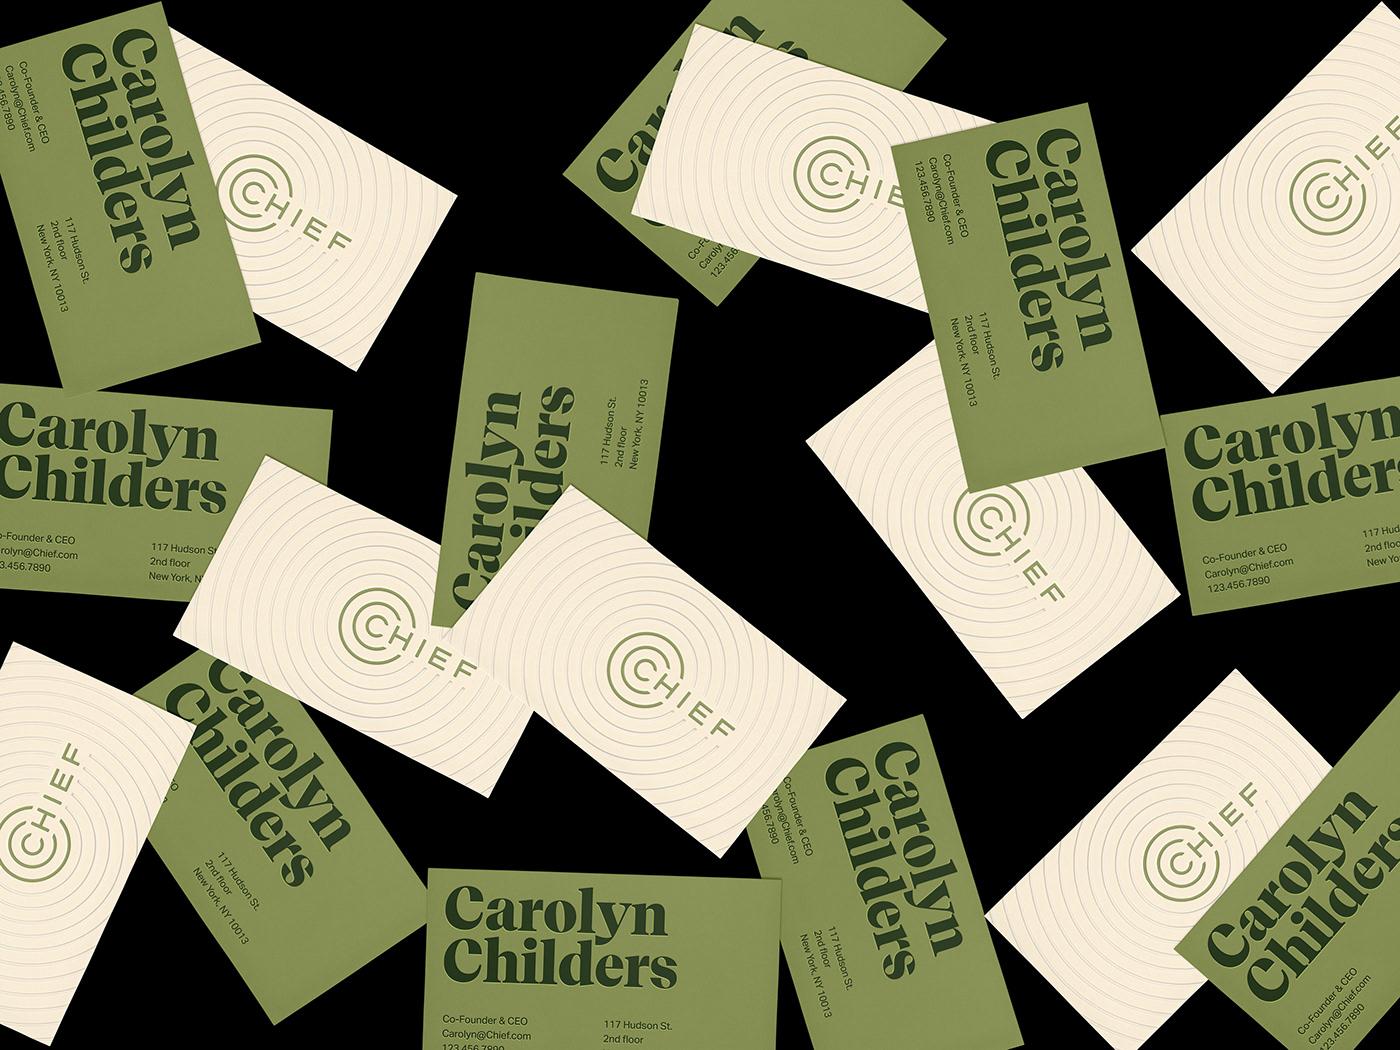 branding  business business card club female graphic design  logo New York Startup system